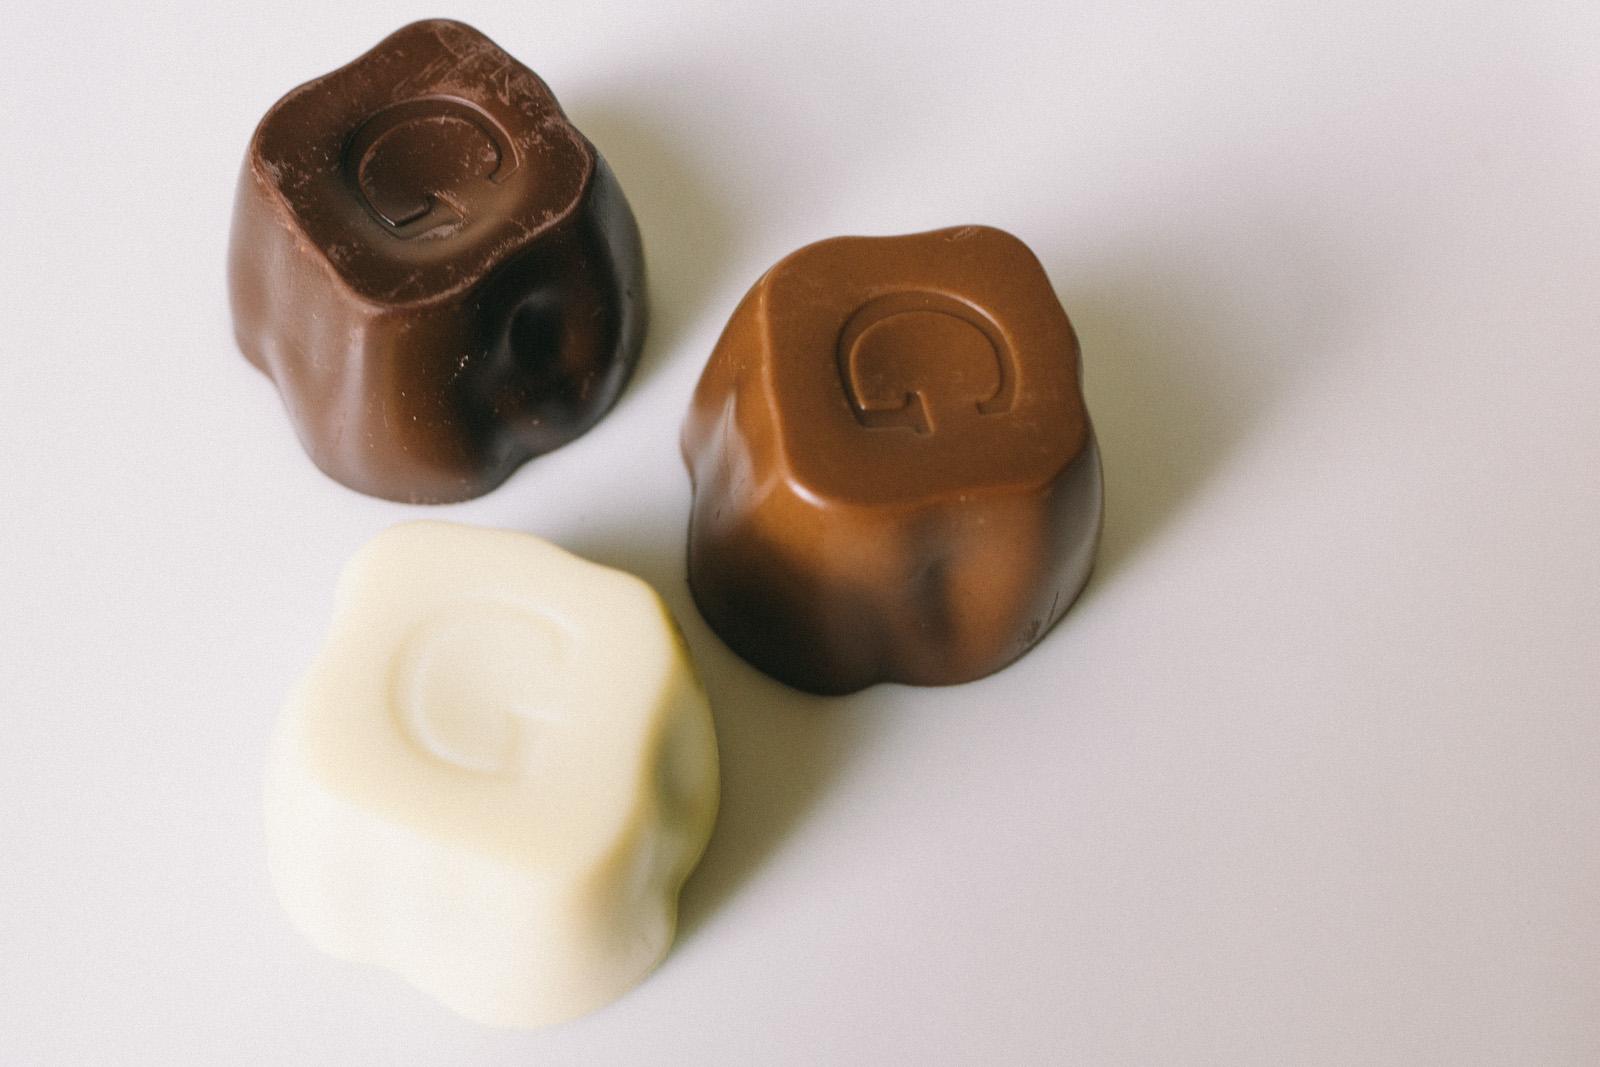 that-food-cray-godiva-chocolate-2013-mid-autumn-festival-mooncakes-40